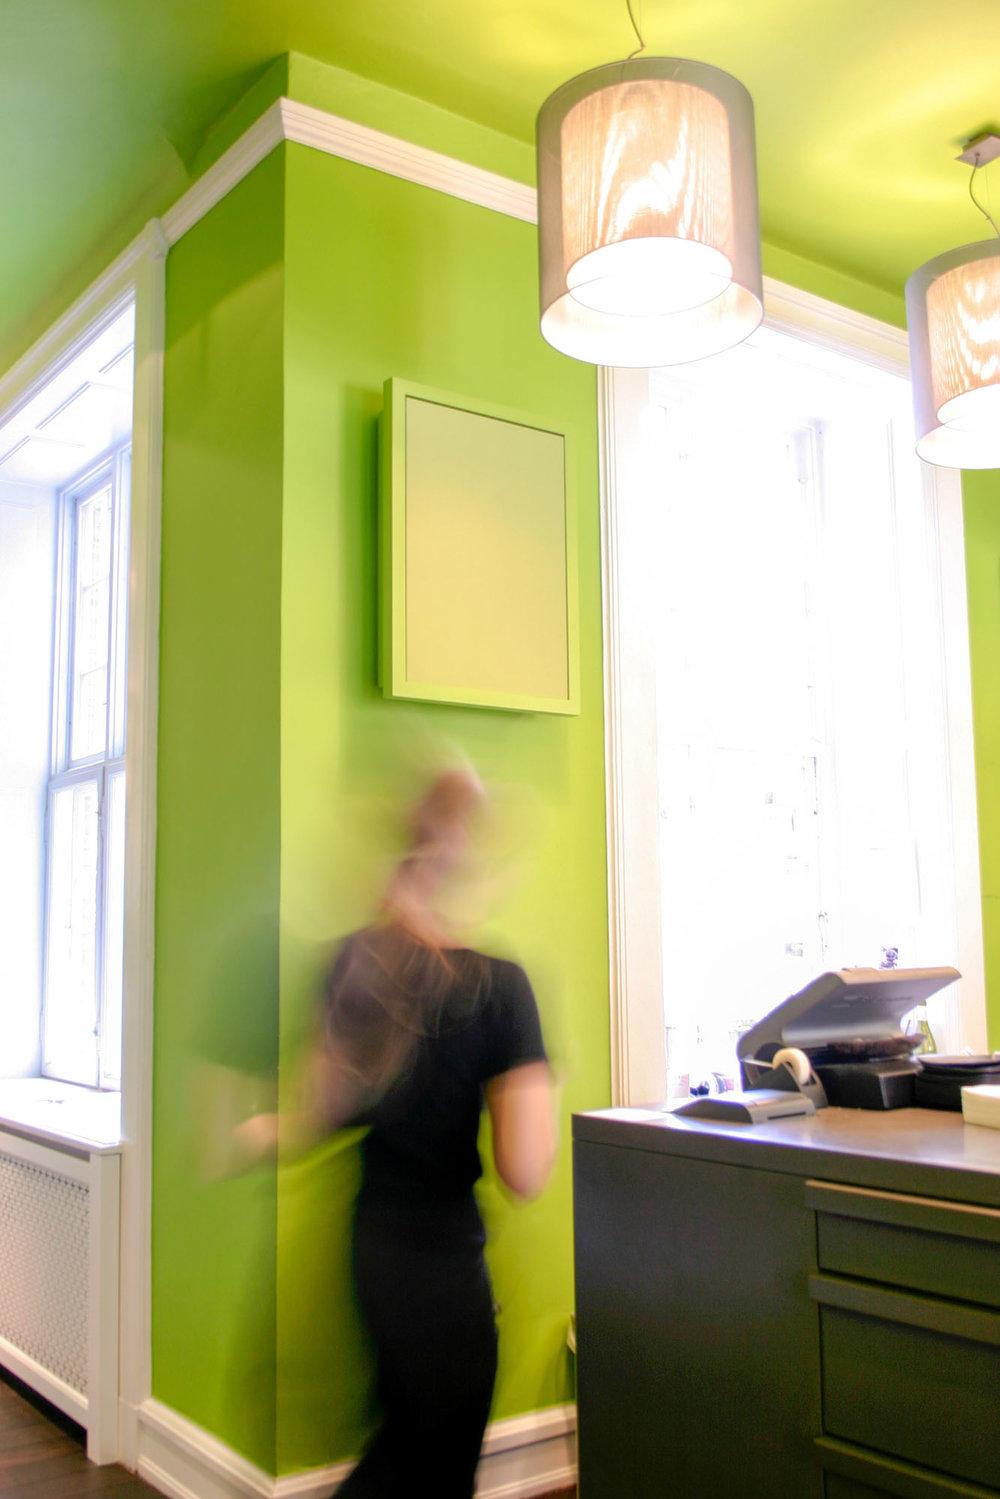 Artcoustic_Stick&Sushi_Frederiksberg_05.jpg